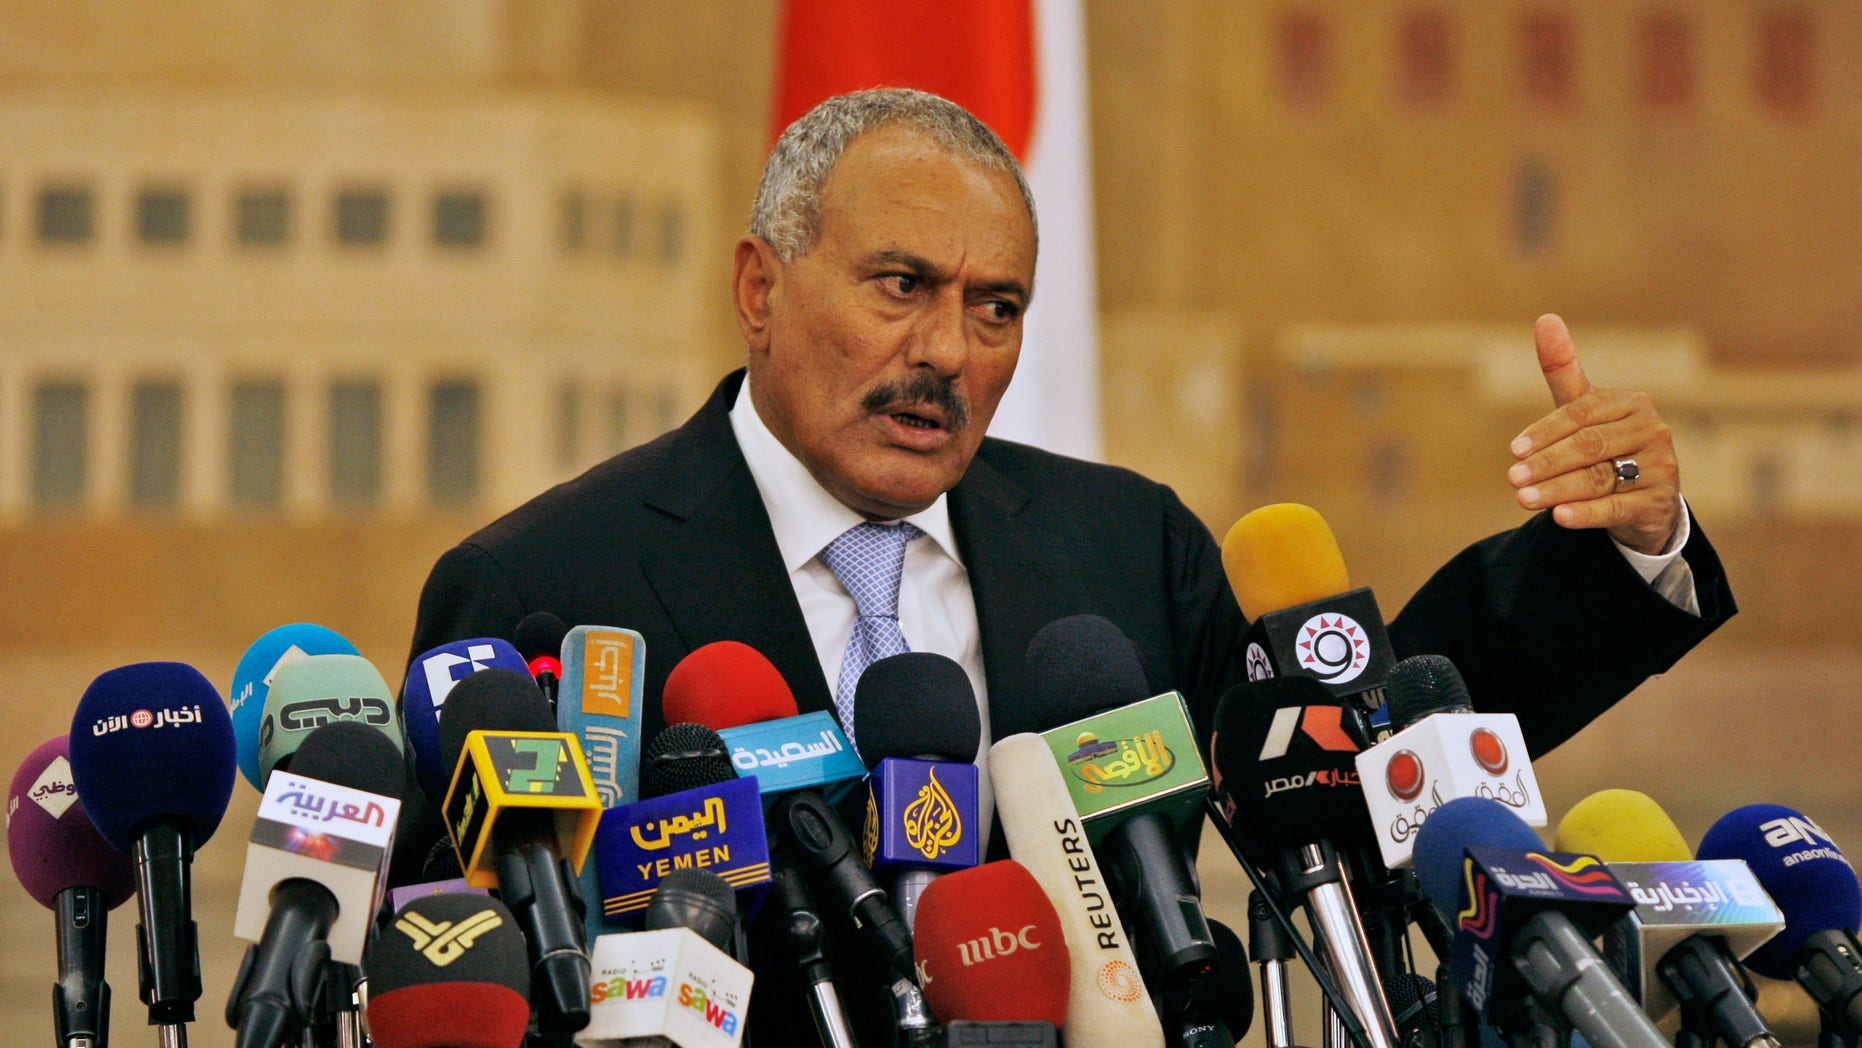 Feb. 21: Yemeni President Ali Abdullah Saleh gestures while attending a media conference in Sanaa, Yemen. Saleh rejected demands that he step down.